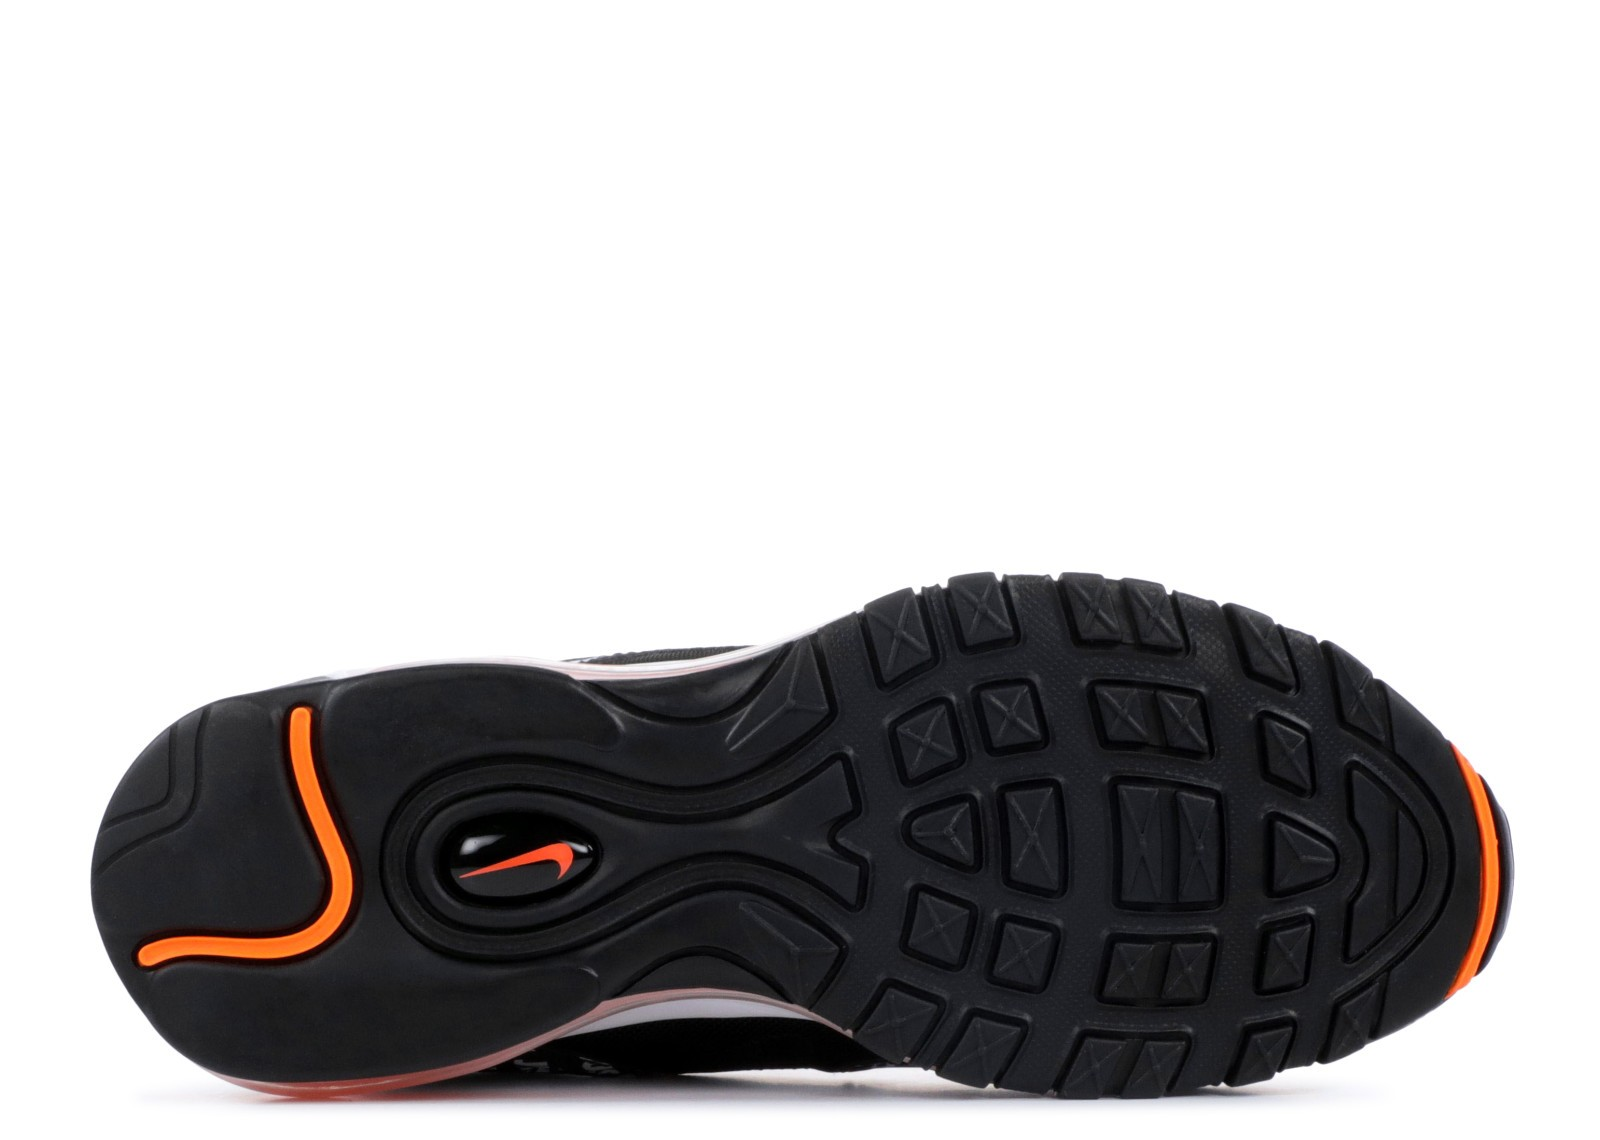 Shoes Men Nike Air Max 97 AT8437 001 (Black) Promotions